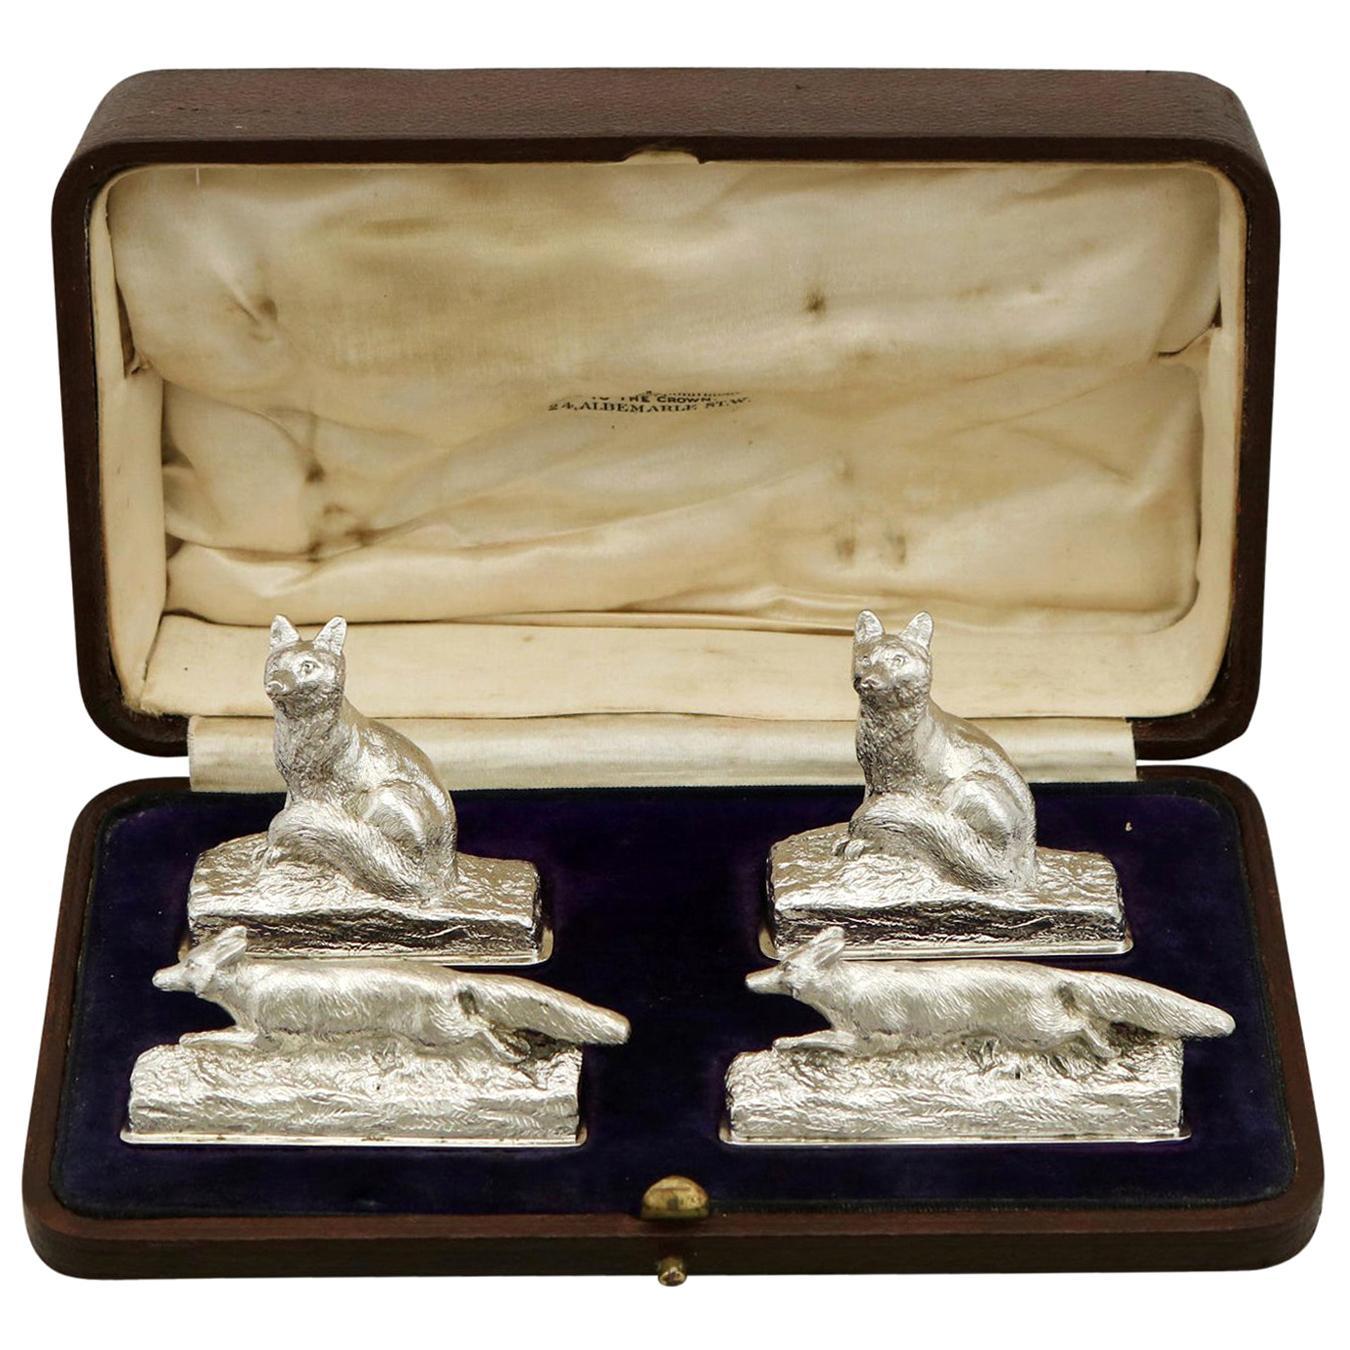 1920s Set of Four Sterling Silver Menu / Card Holders by Garrard & Co Ltd